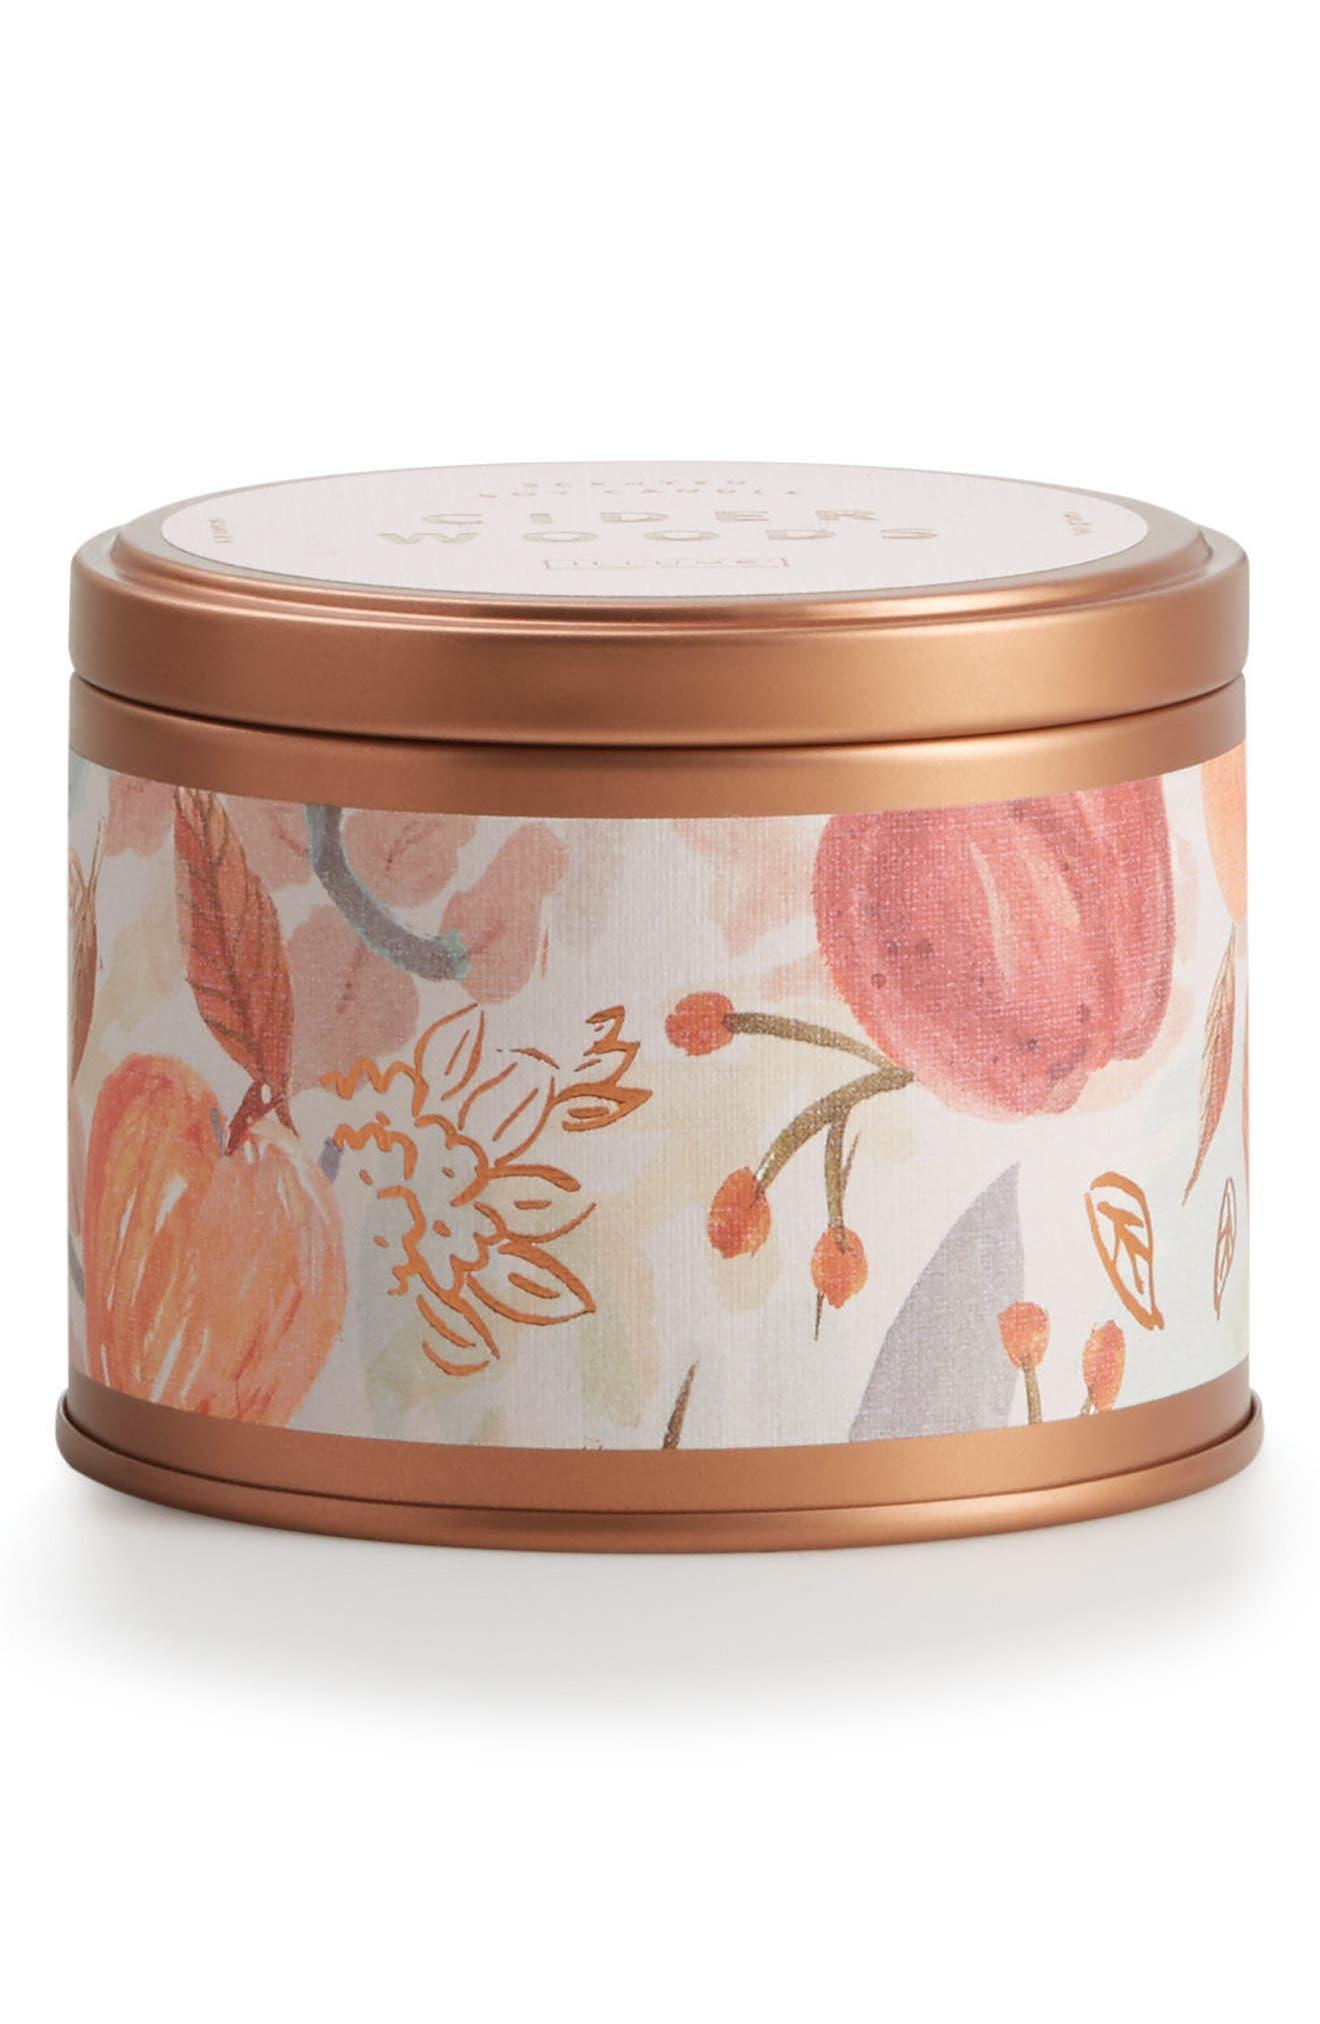 ILLUME® Scented Candle Tin